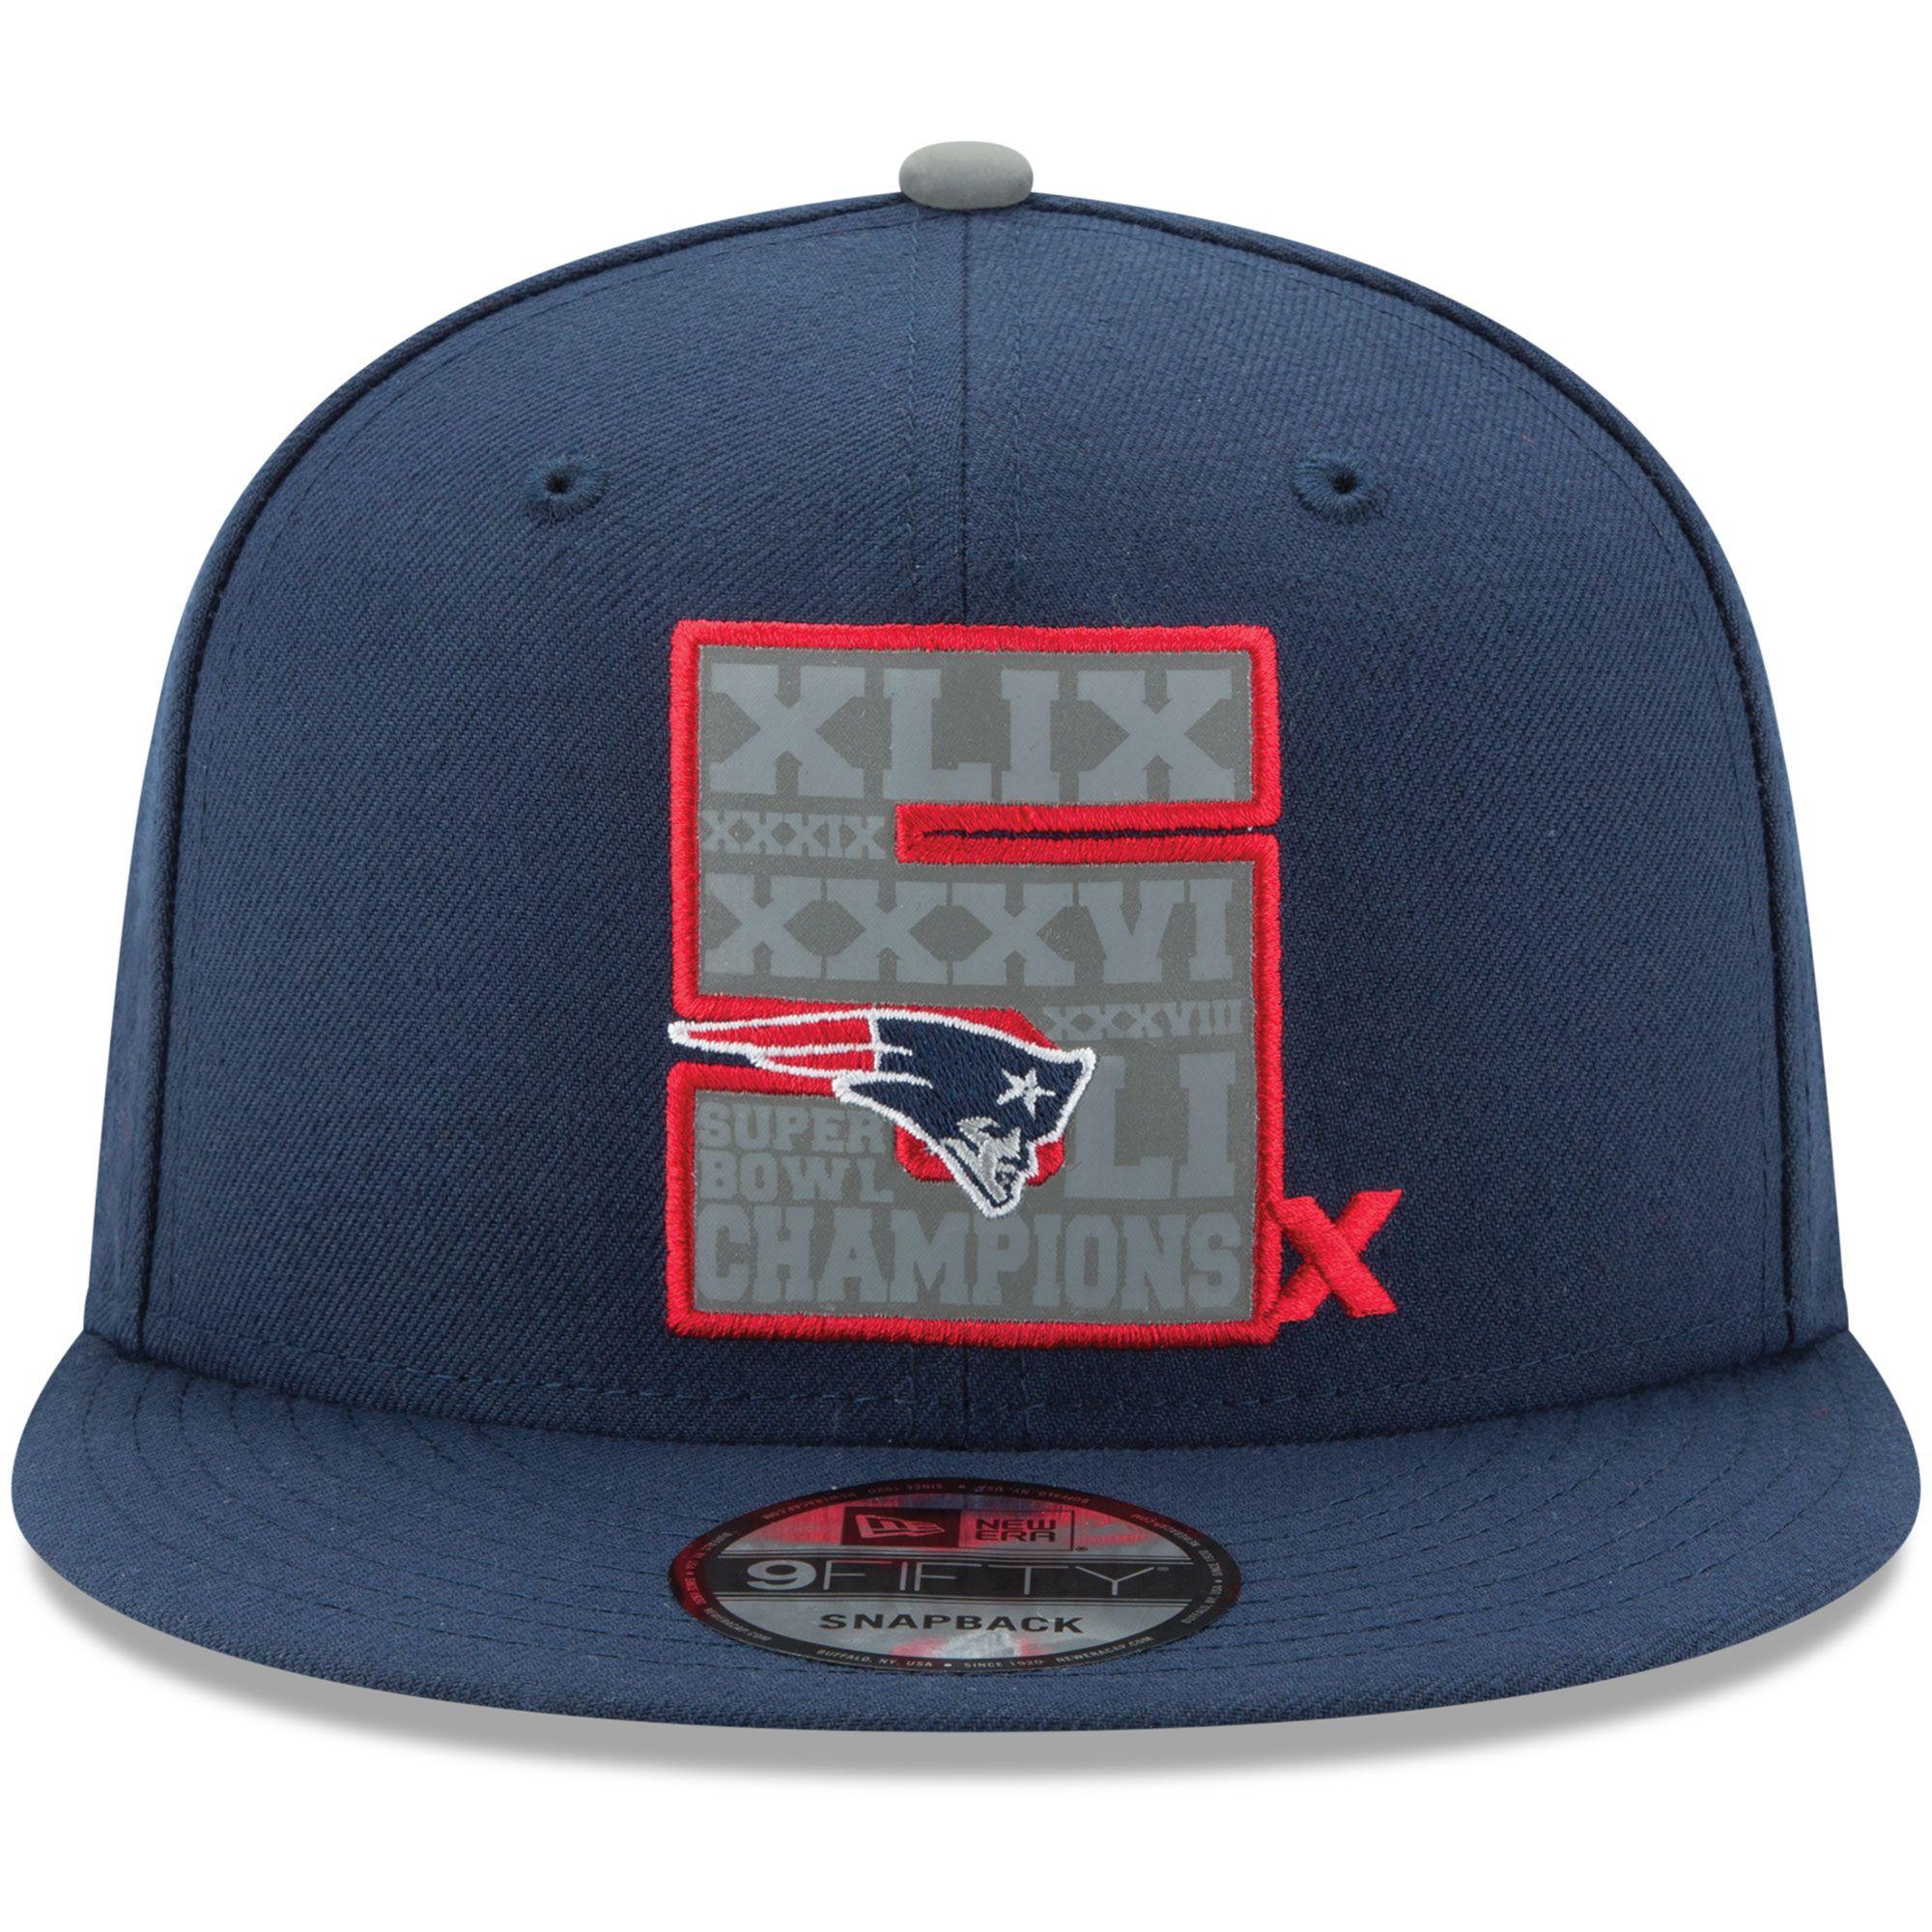 b35ff524842 New Era New England Patriots Navy 5-Time Super Bowl Champions 9FIFTY  Snapback Adjustable Hat